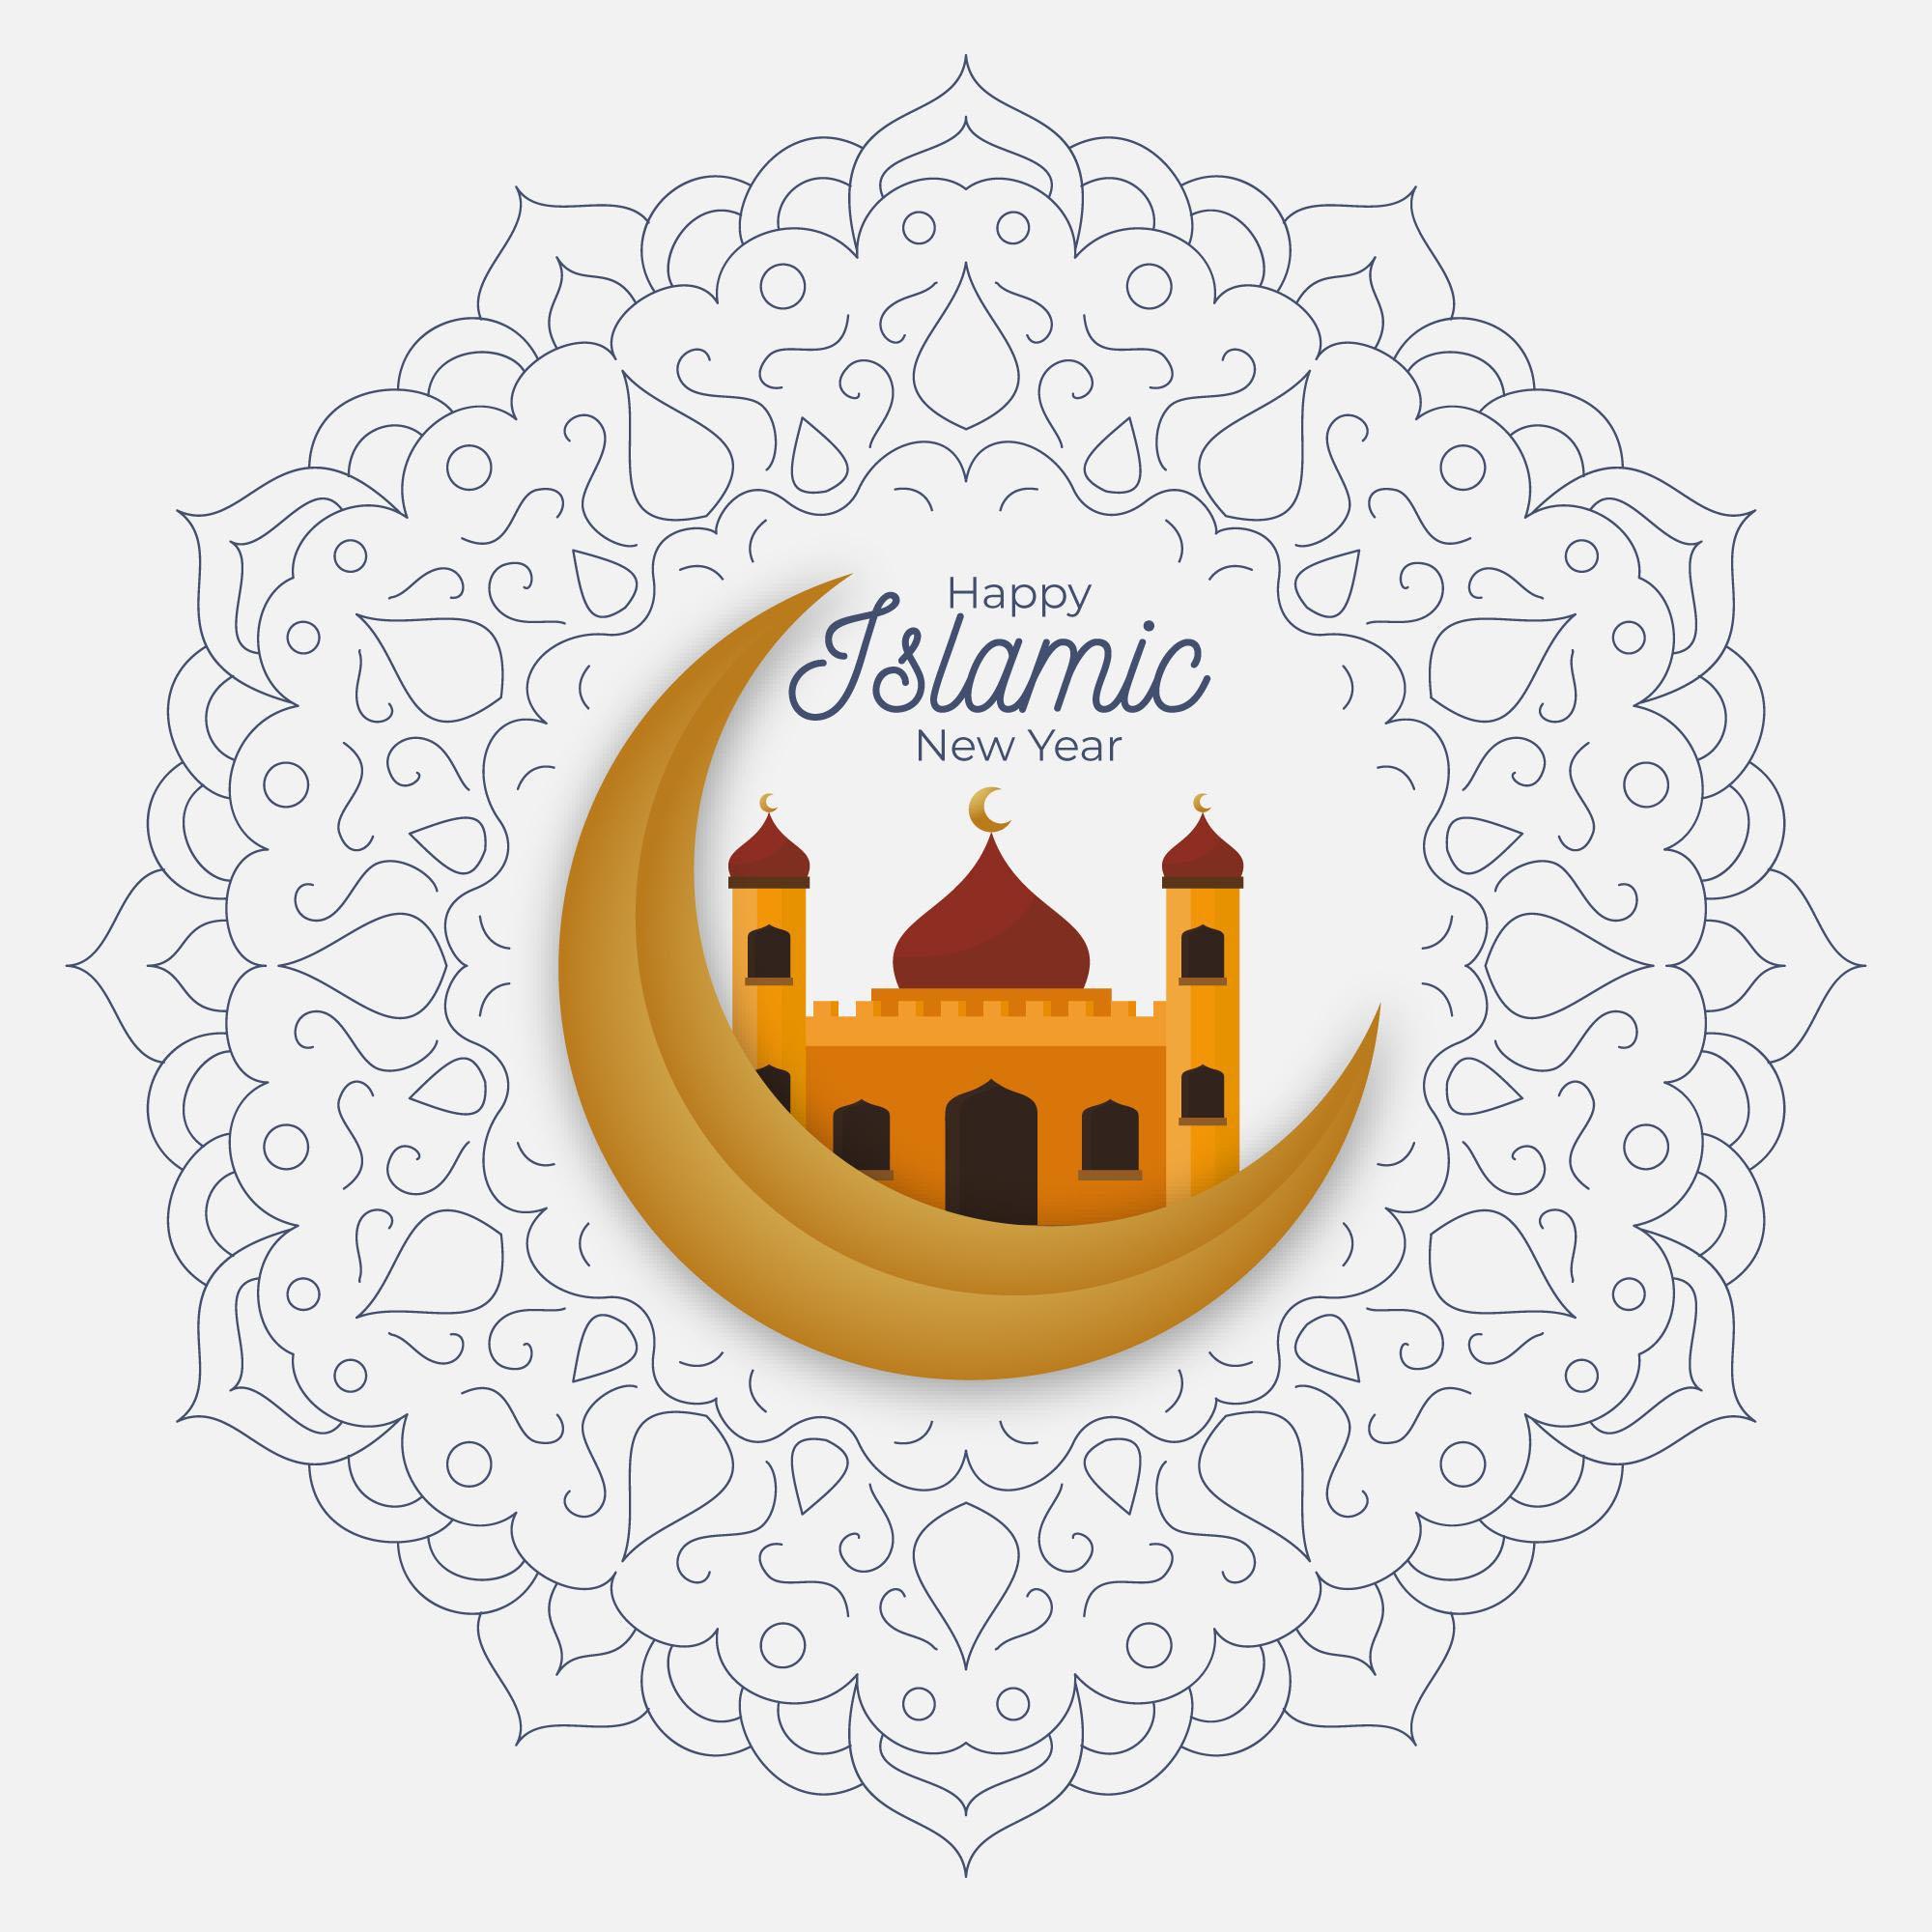 Kumpulan Gambar Dan Ucapan Tahun Baru Islam 1442 H Yang Cocok Dijadikan Status Di Medsos